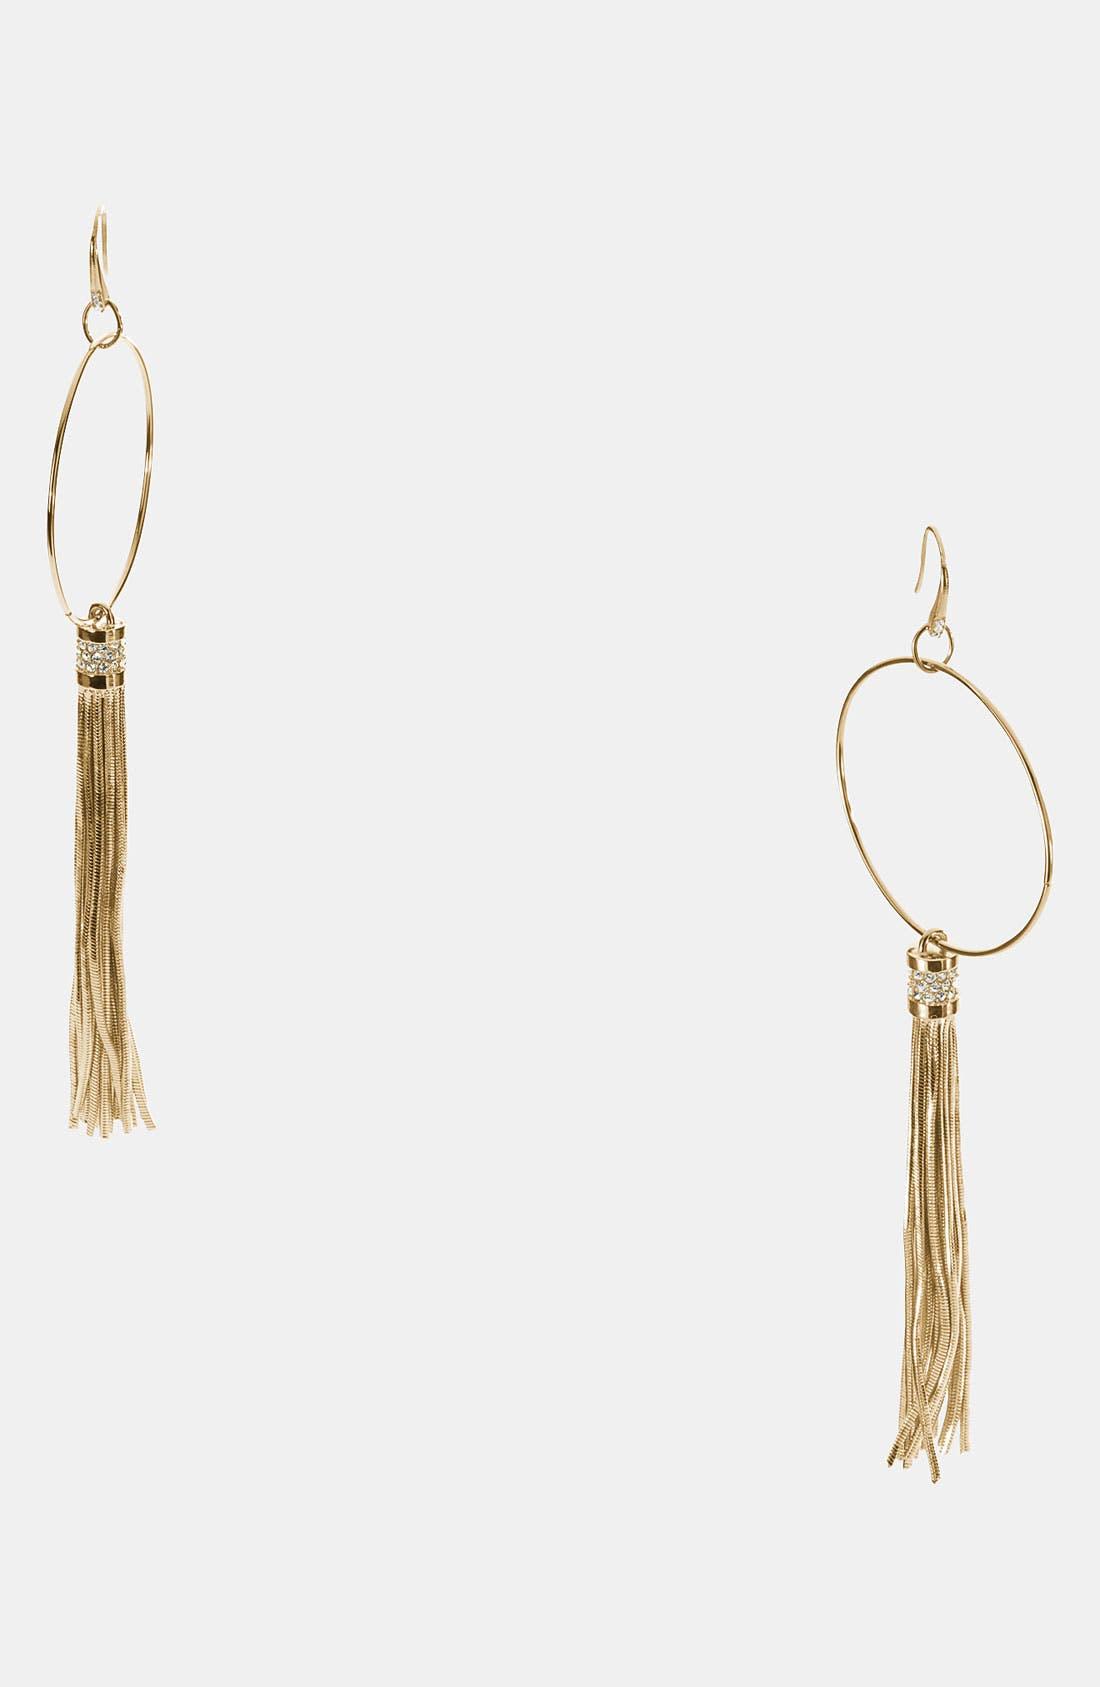 Alternate Image 1 Selected - Michael Kors 'Equestrian Luxury' Linear Earrings